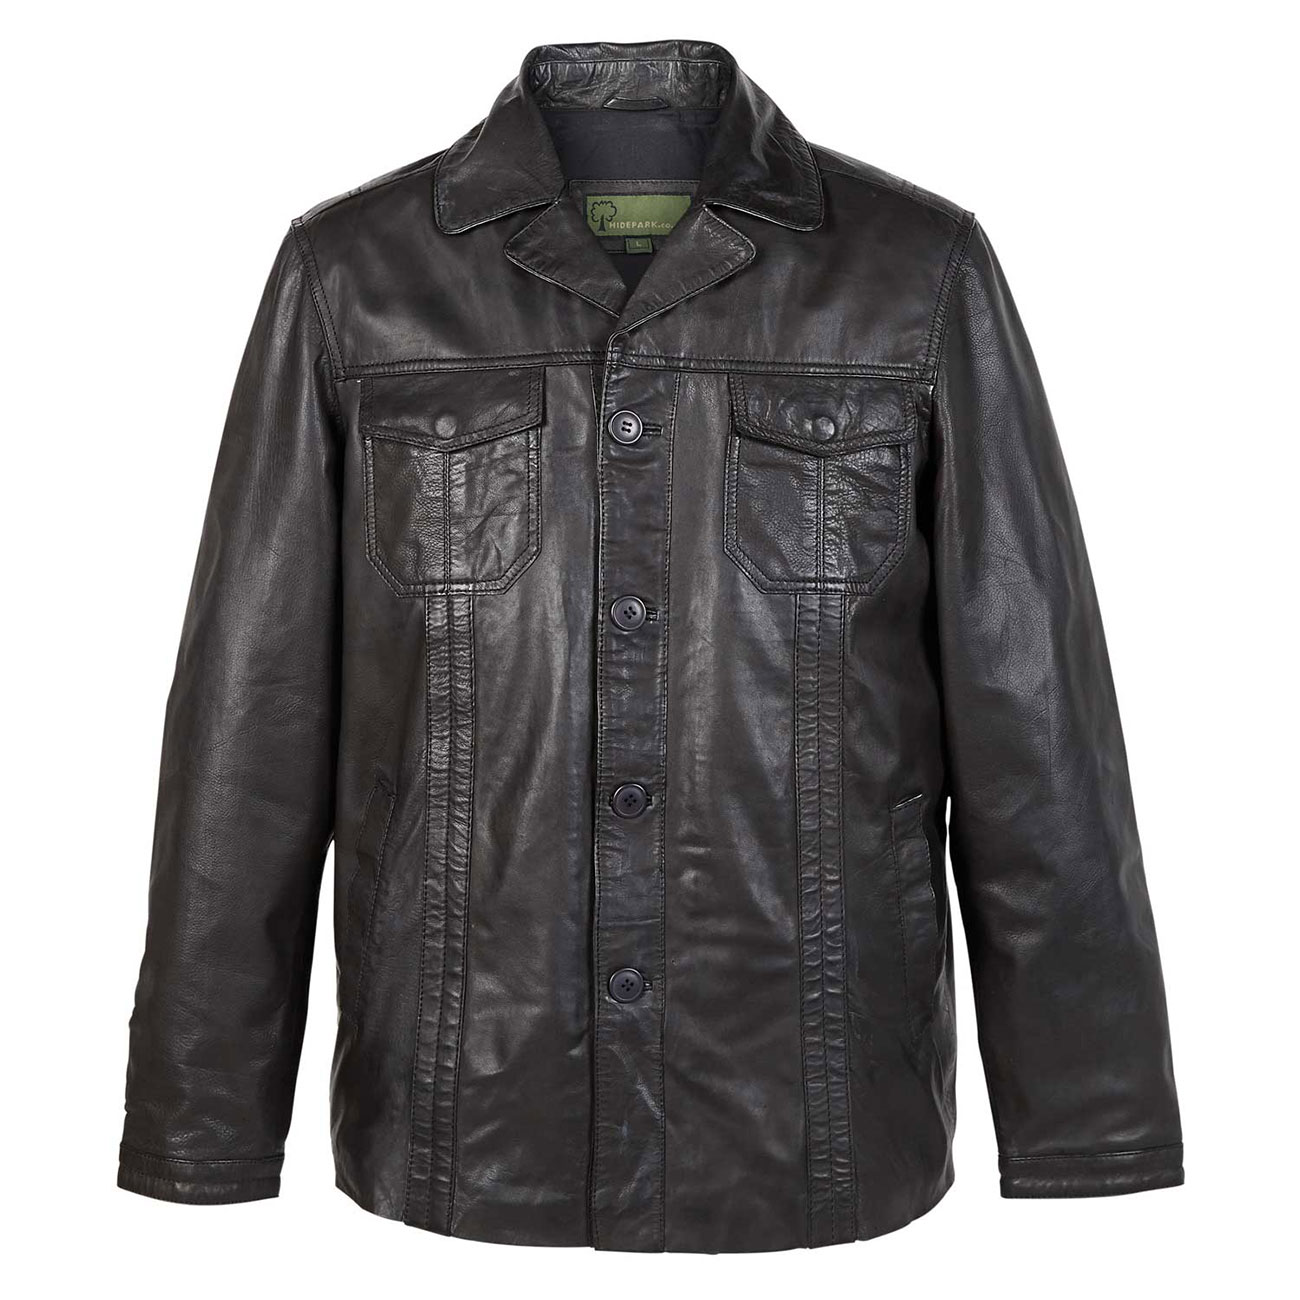 Gents Leather Jacket Black Adam